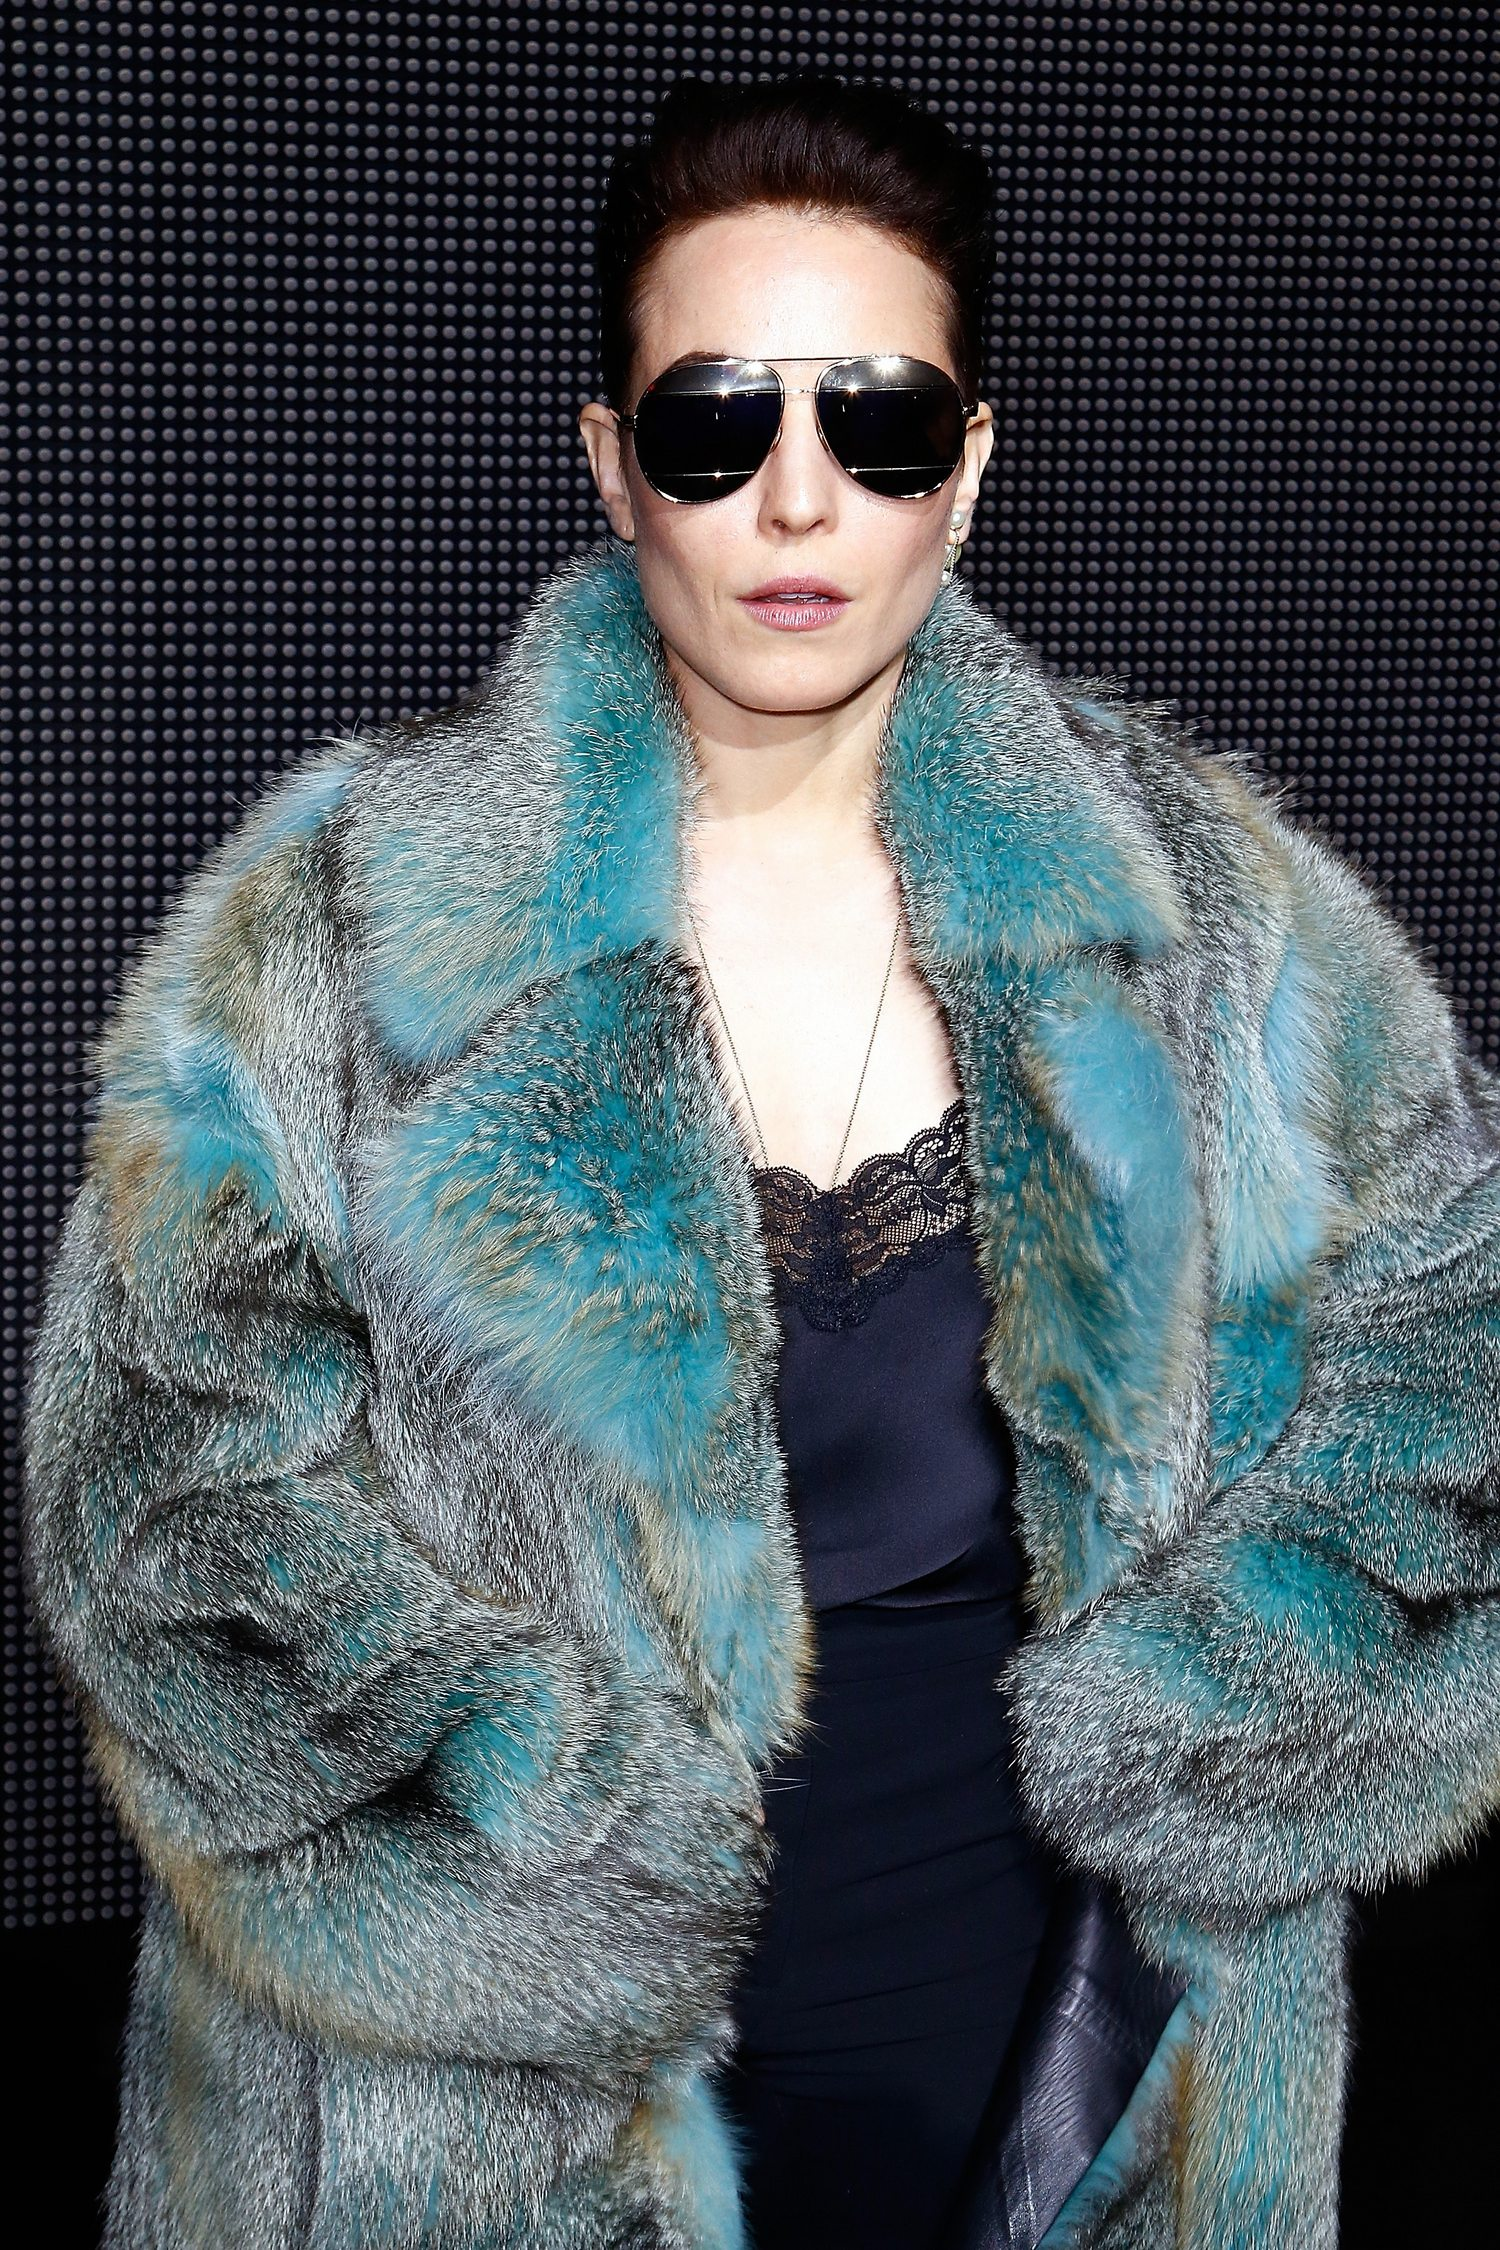 Noomi Rapace at Paris Fashion Week Dior Menswear FW